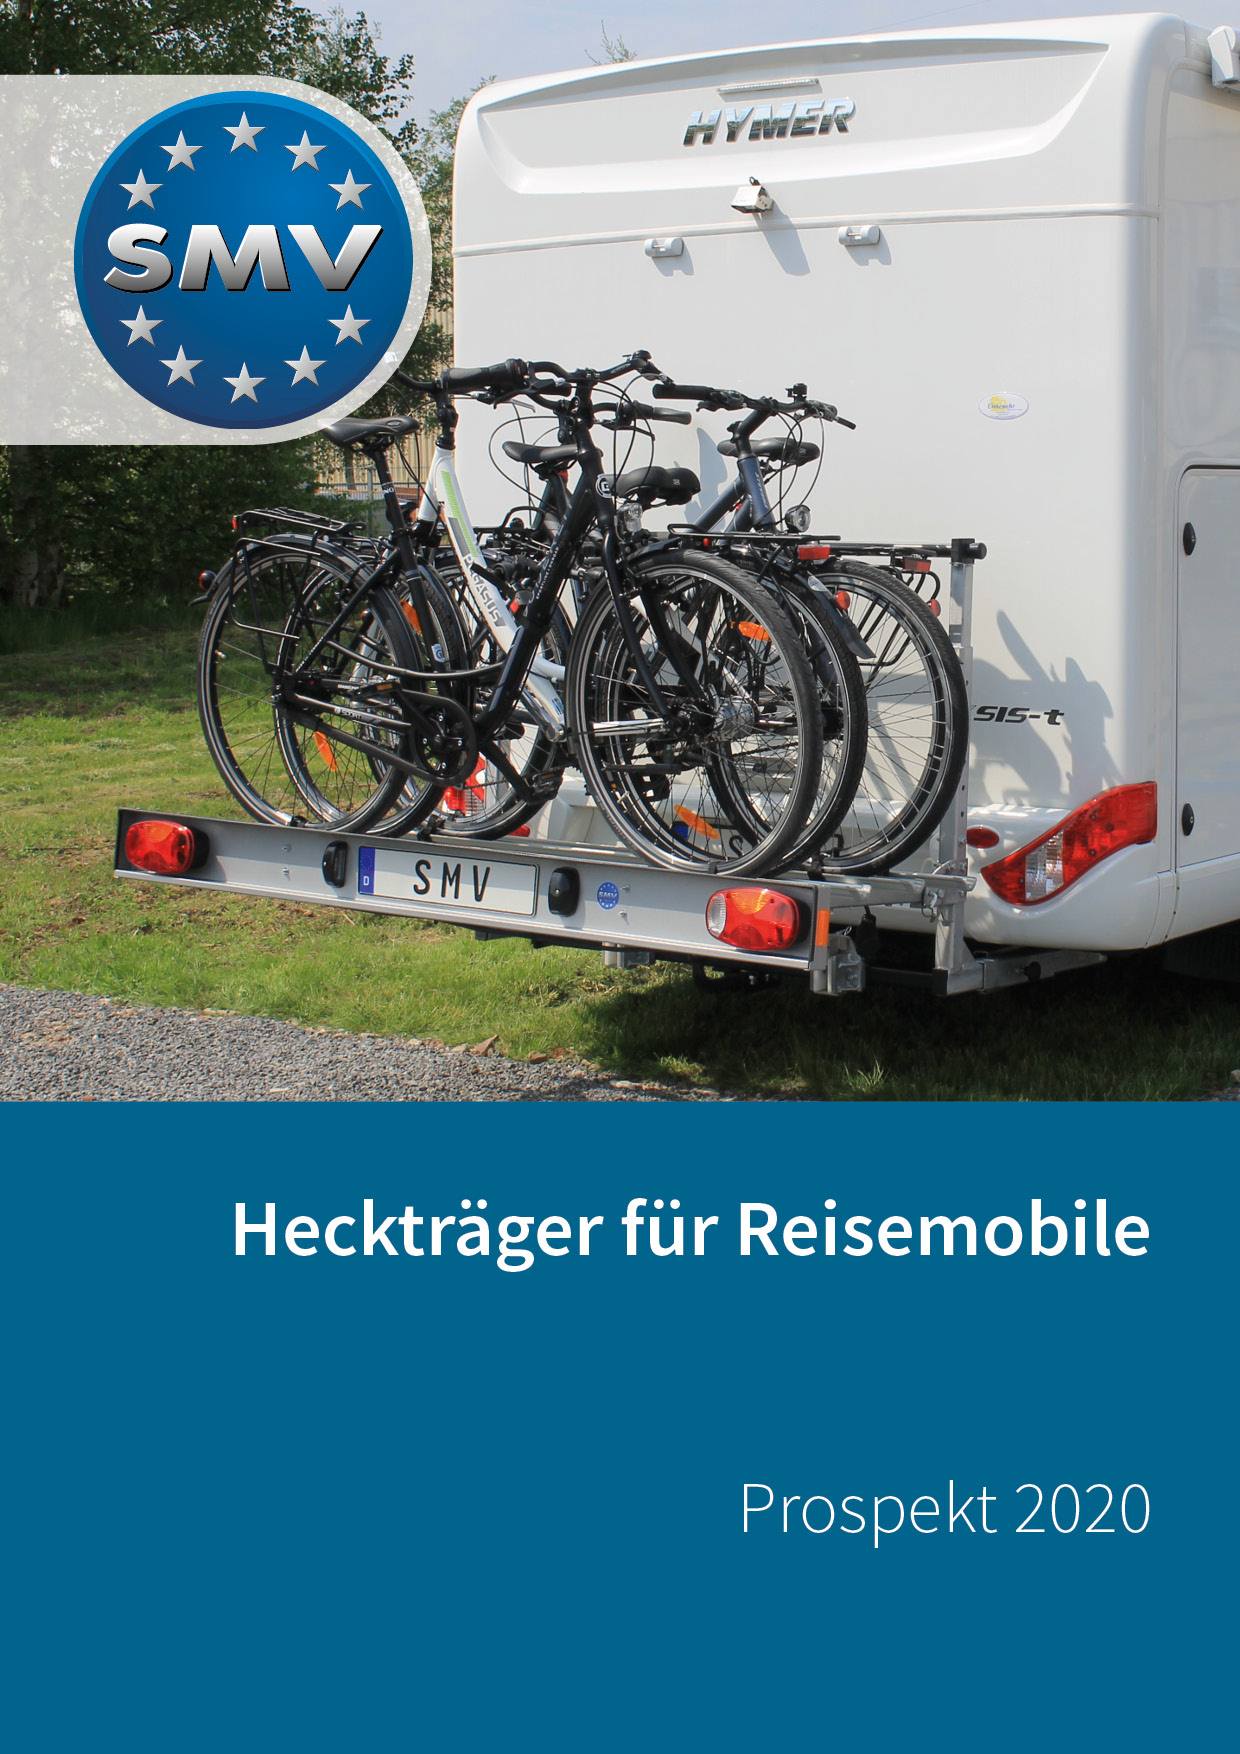 SMV Hecktraeger Wohnmobile 2020